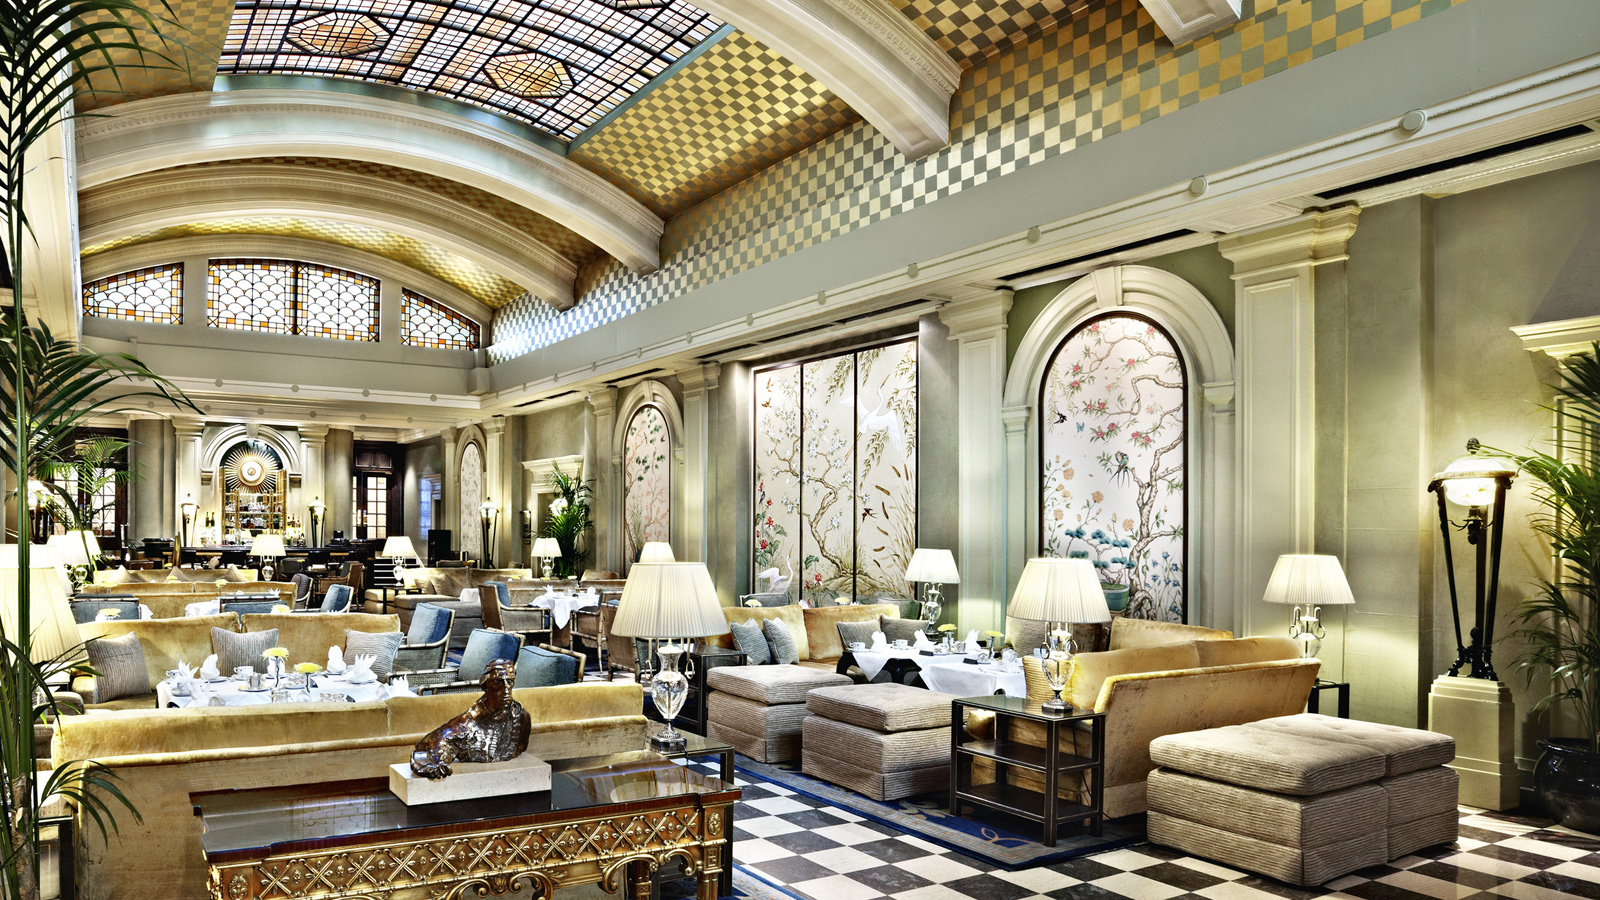 Park Lane Hotel Mayfair Afternoon Tea